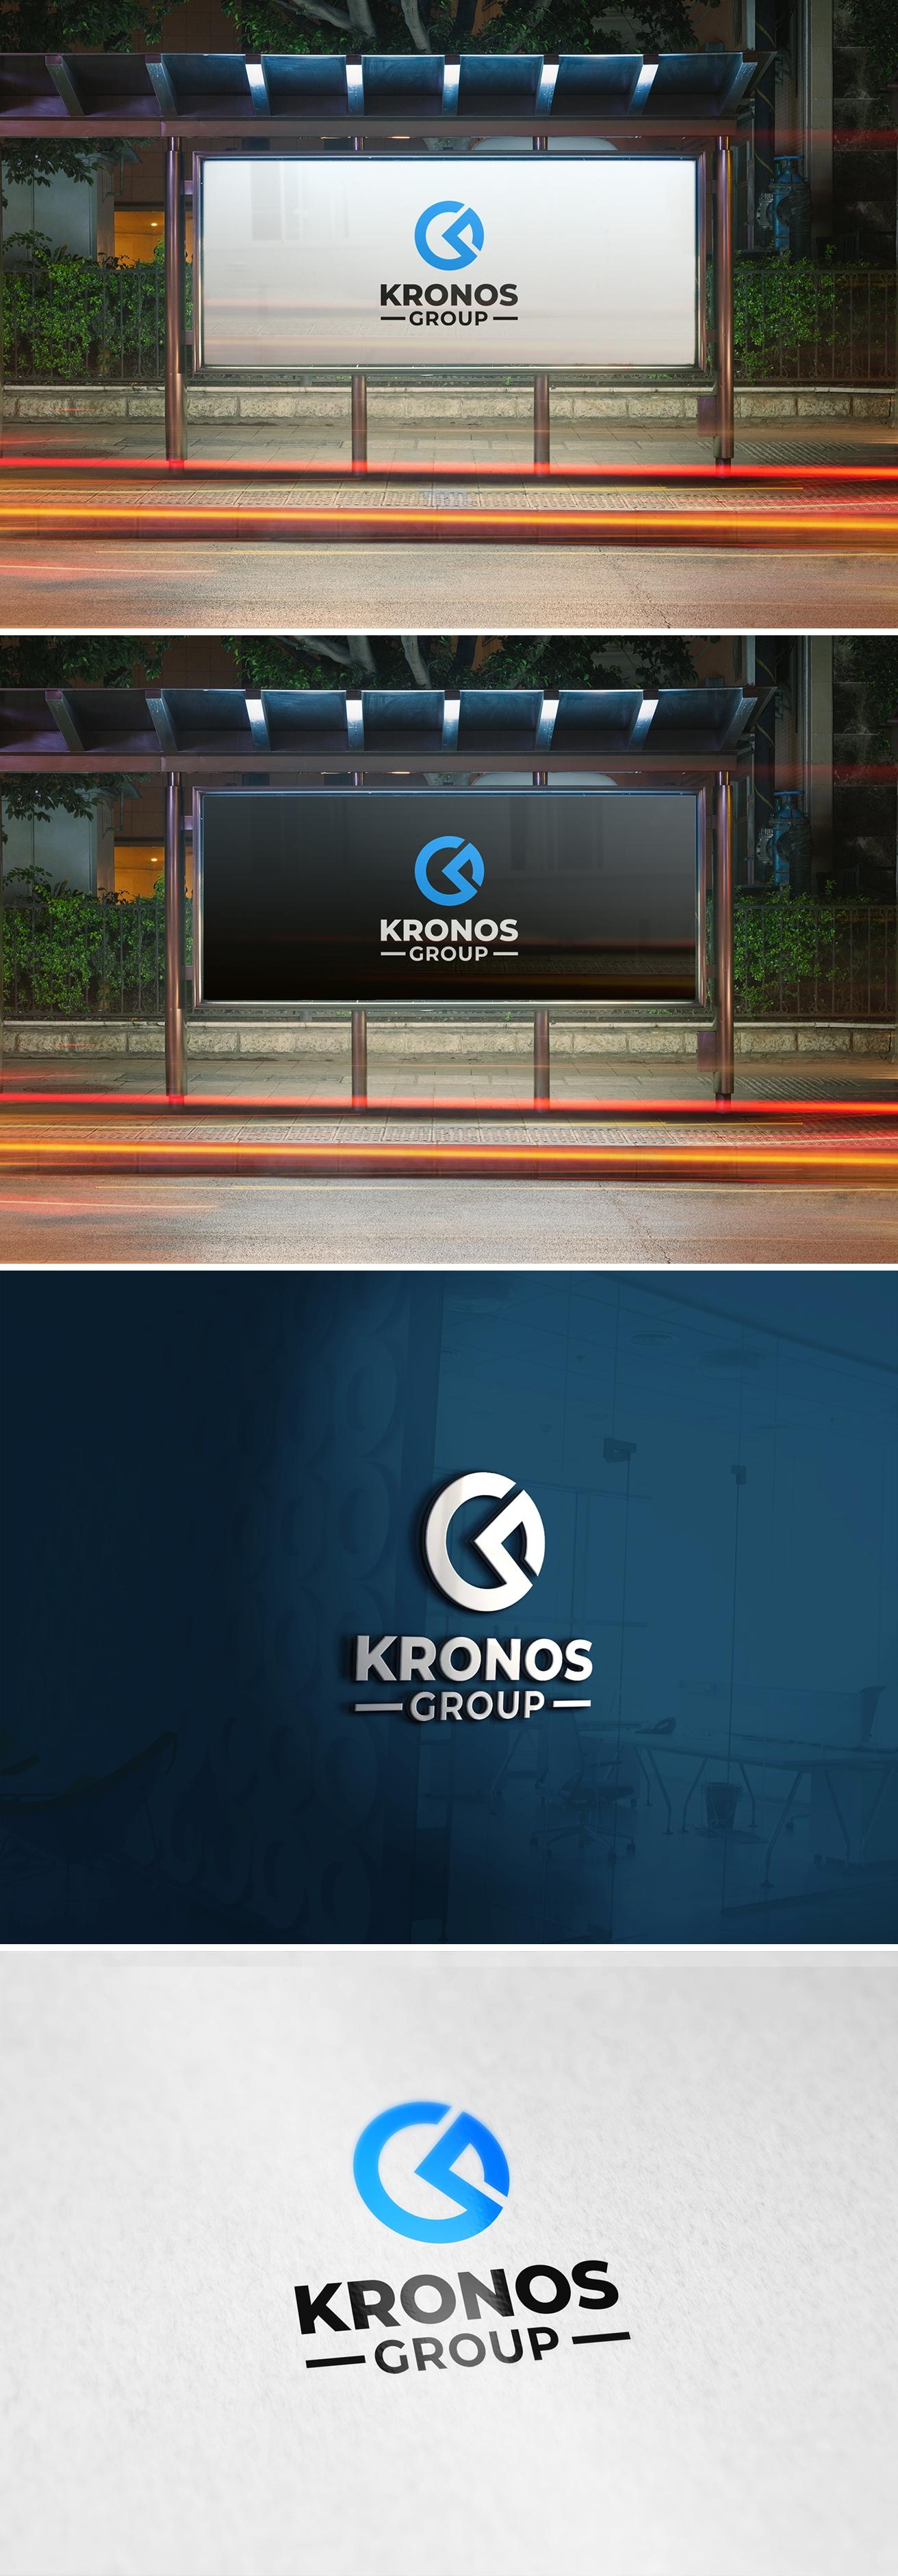 Разработать логотип KRONOS фото f_0285fafd949d5d31.jpg